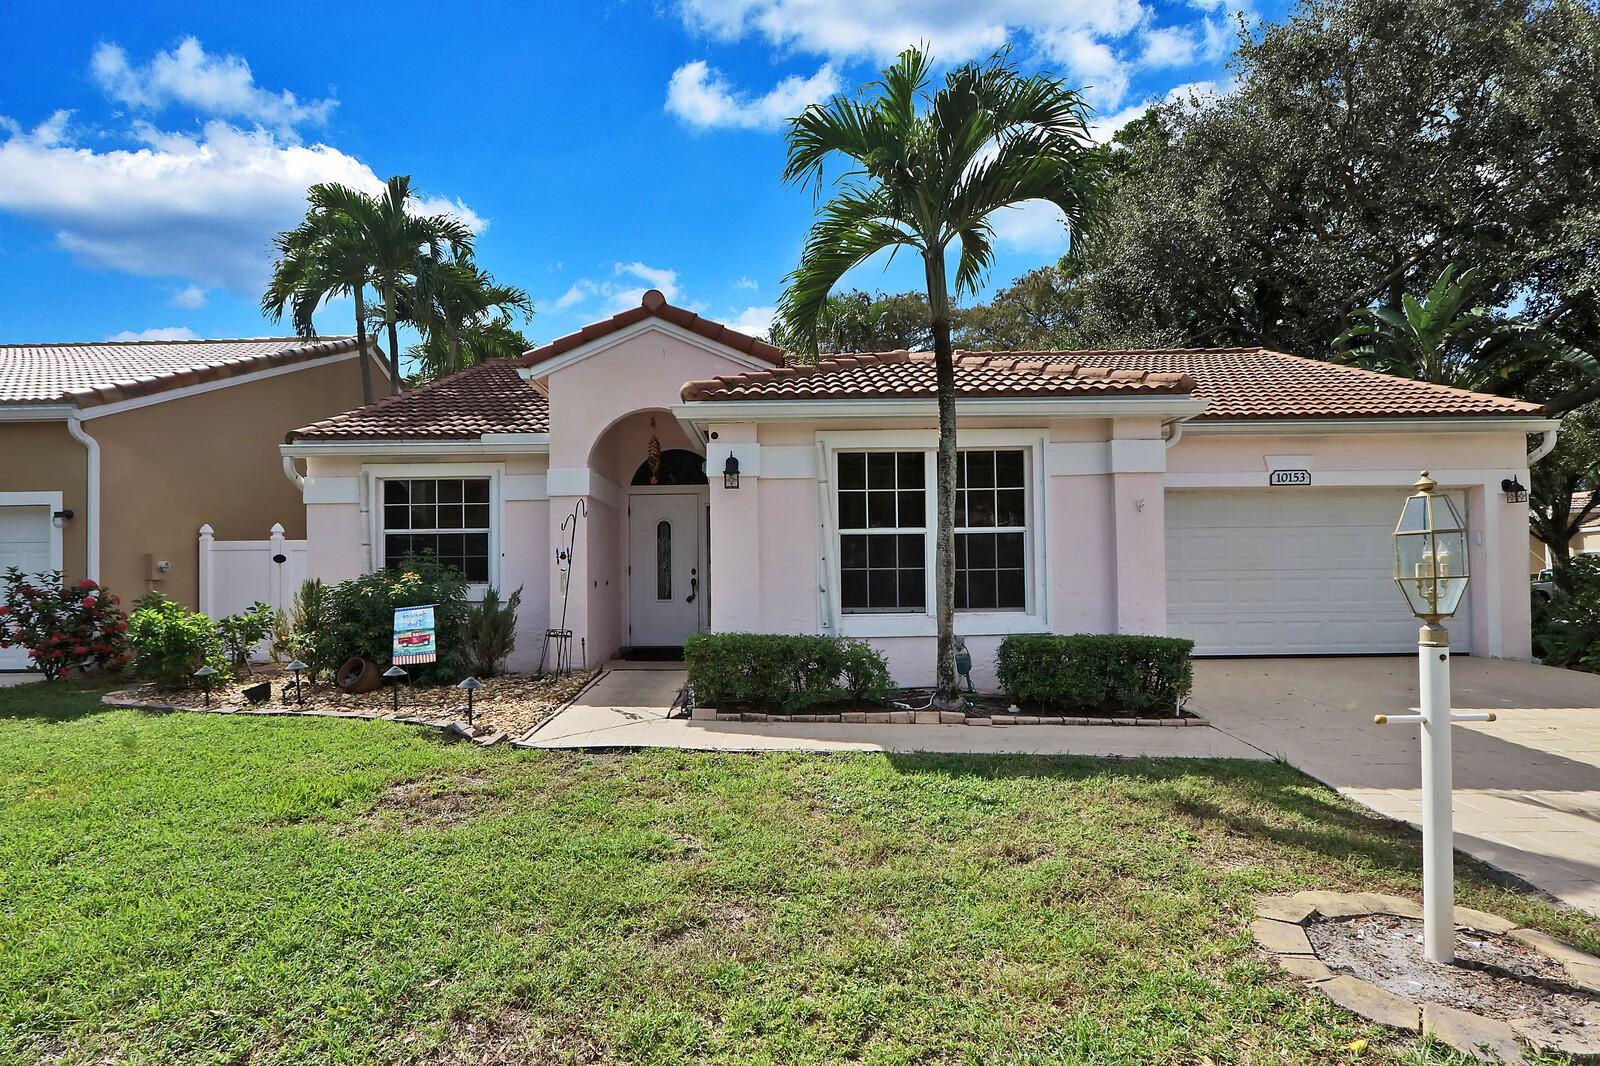 Photo of 10153 Aspen Way, Palm Beach Gardens, FL 33410 (MLS # RX-10663718)